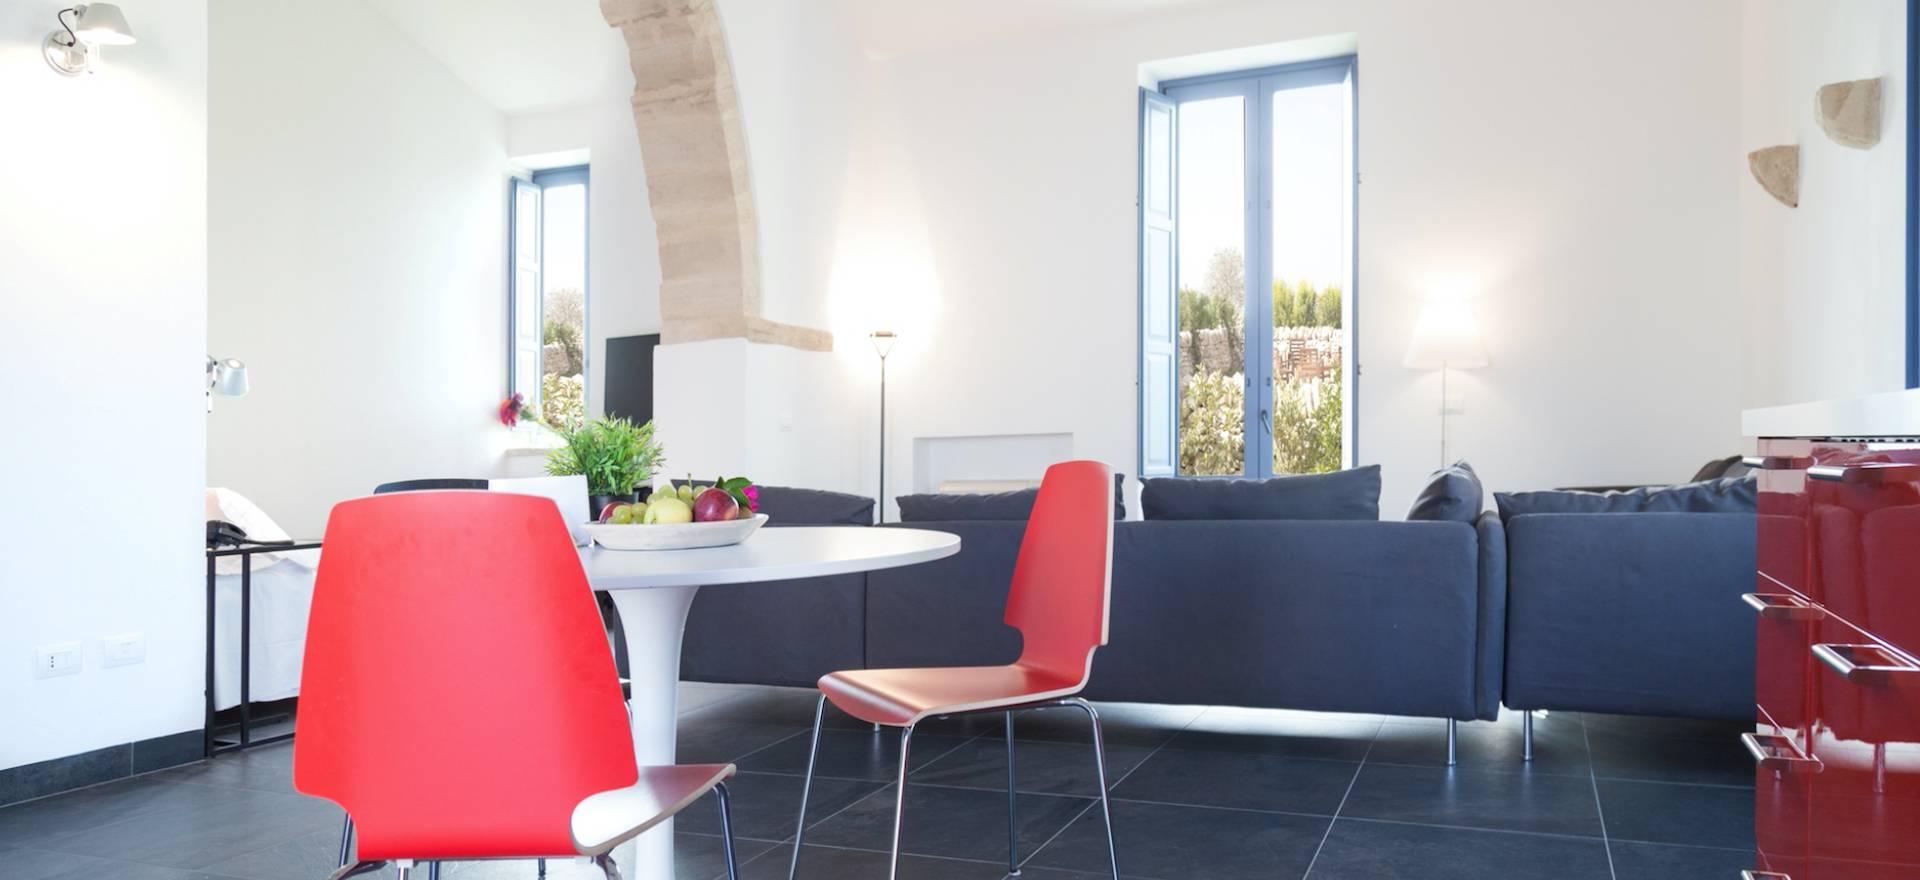 Agriturismo met grote appartementen op Sicilië